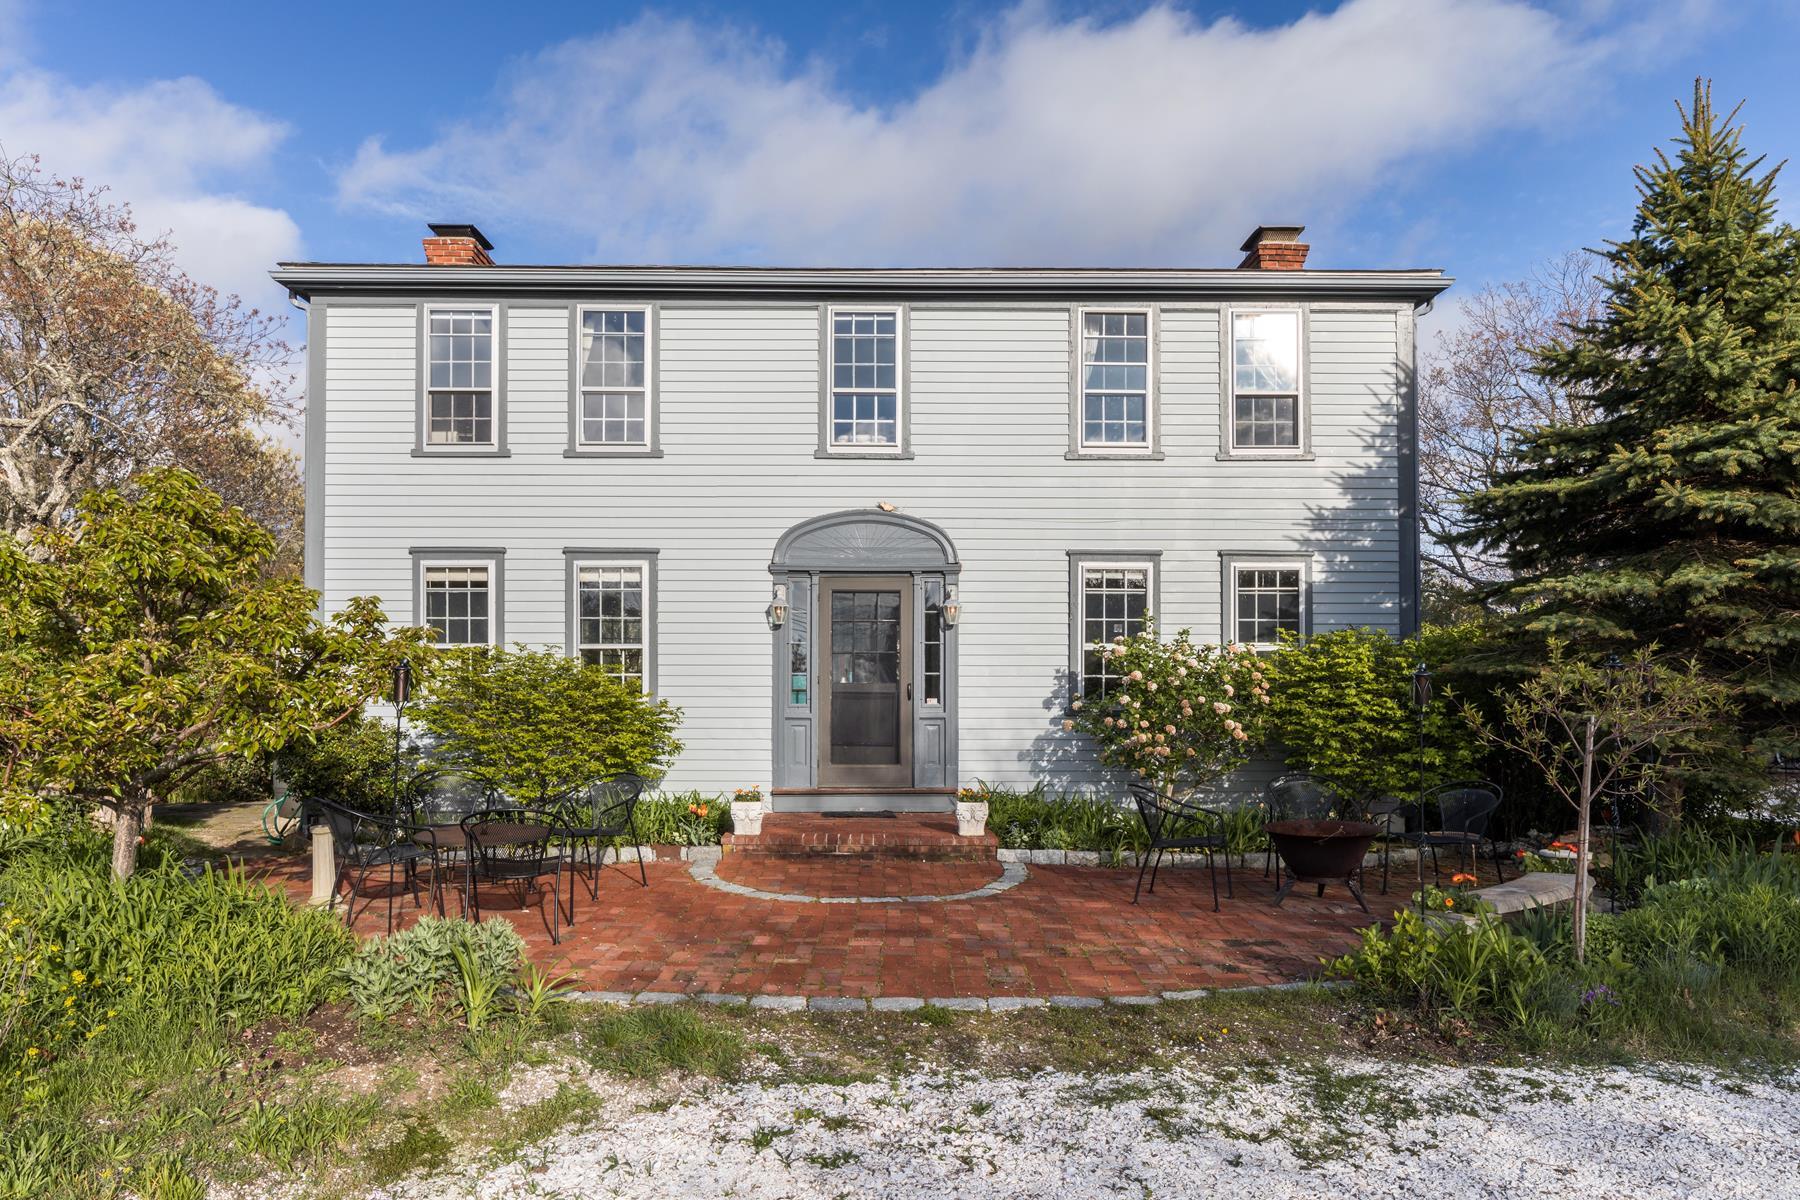 Single Family Homes για την Πώληση στο Antique jewel 24 Old County Road, North Truro, Μασαχουσετη 02666 Ηνωμένες Πολιτείες